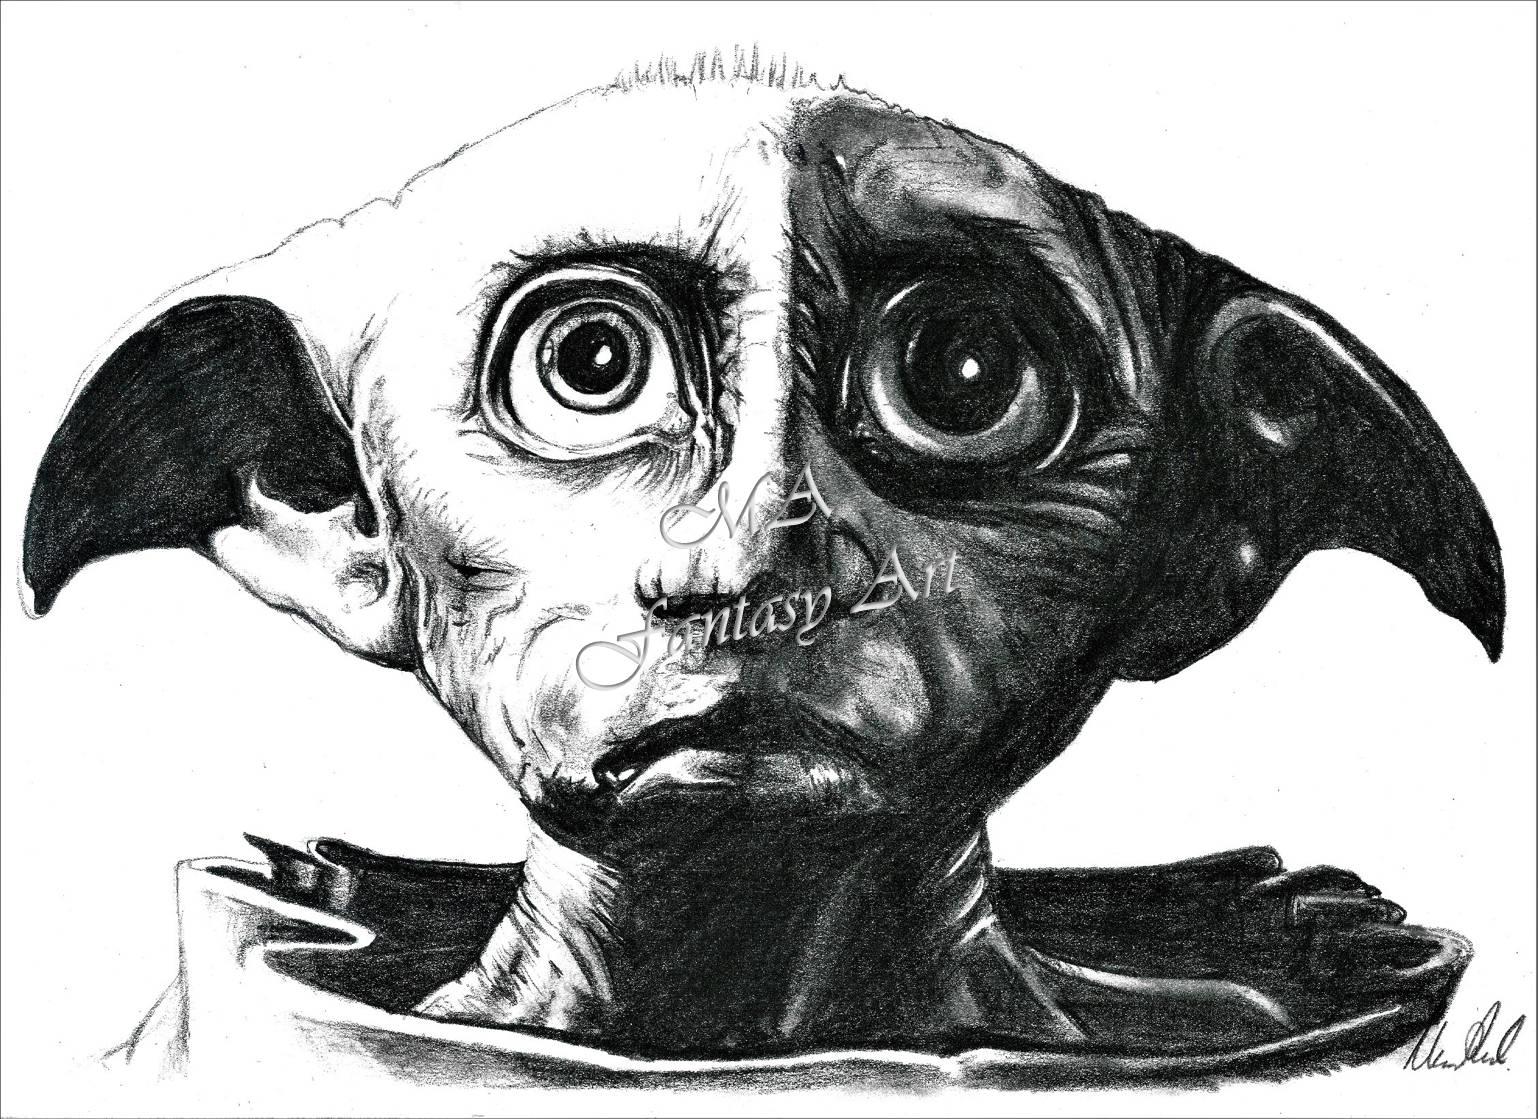 dobby bleistift portrait druck harry potter harry potter | etsy